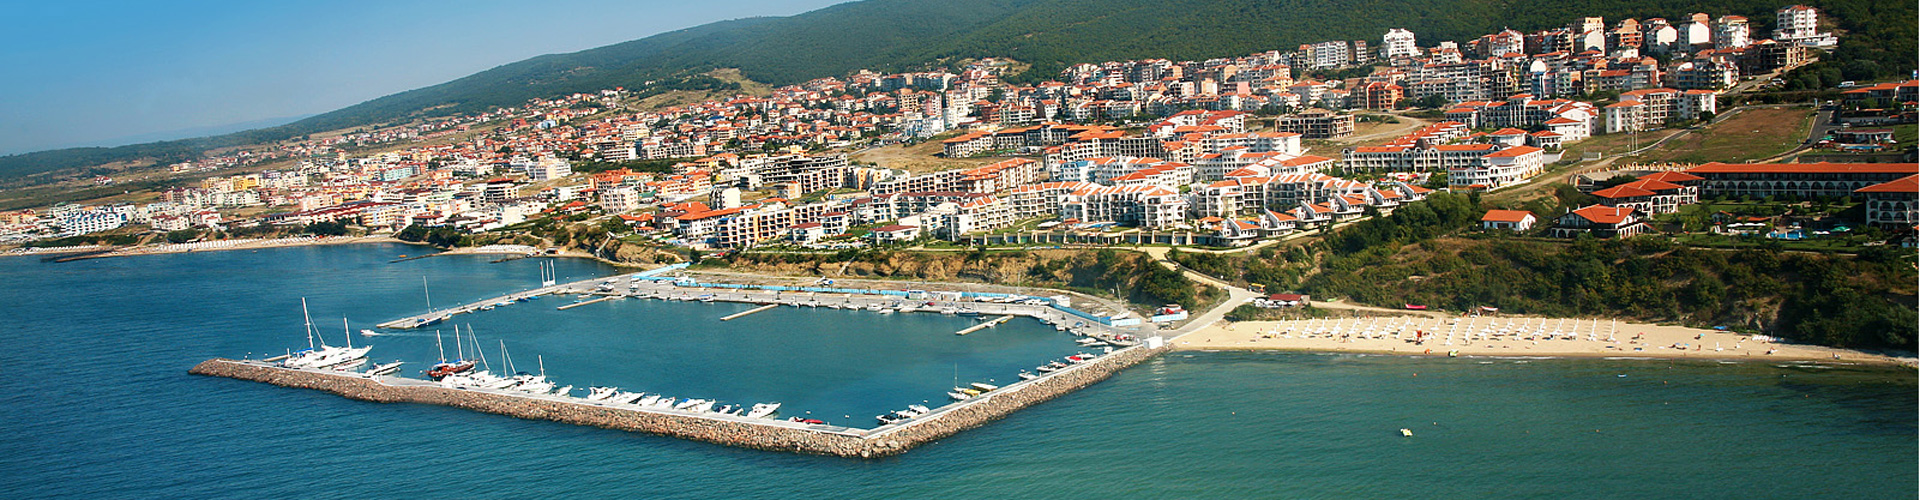 TransferTaxi-EUROPE | Sveti_Vlas_resort - TransferTaxi-EUROPE